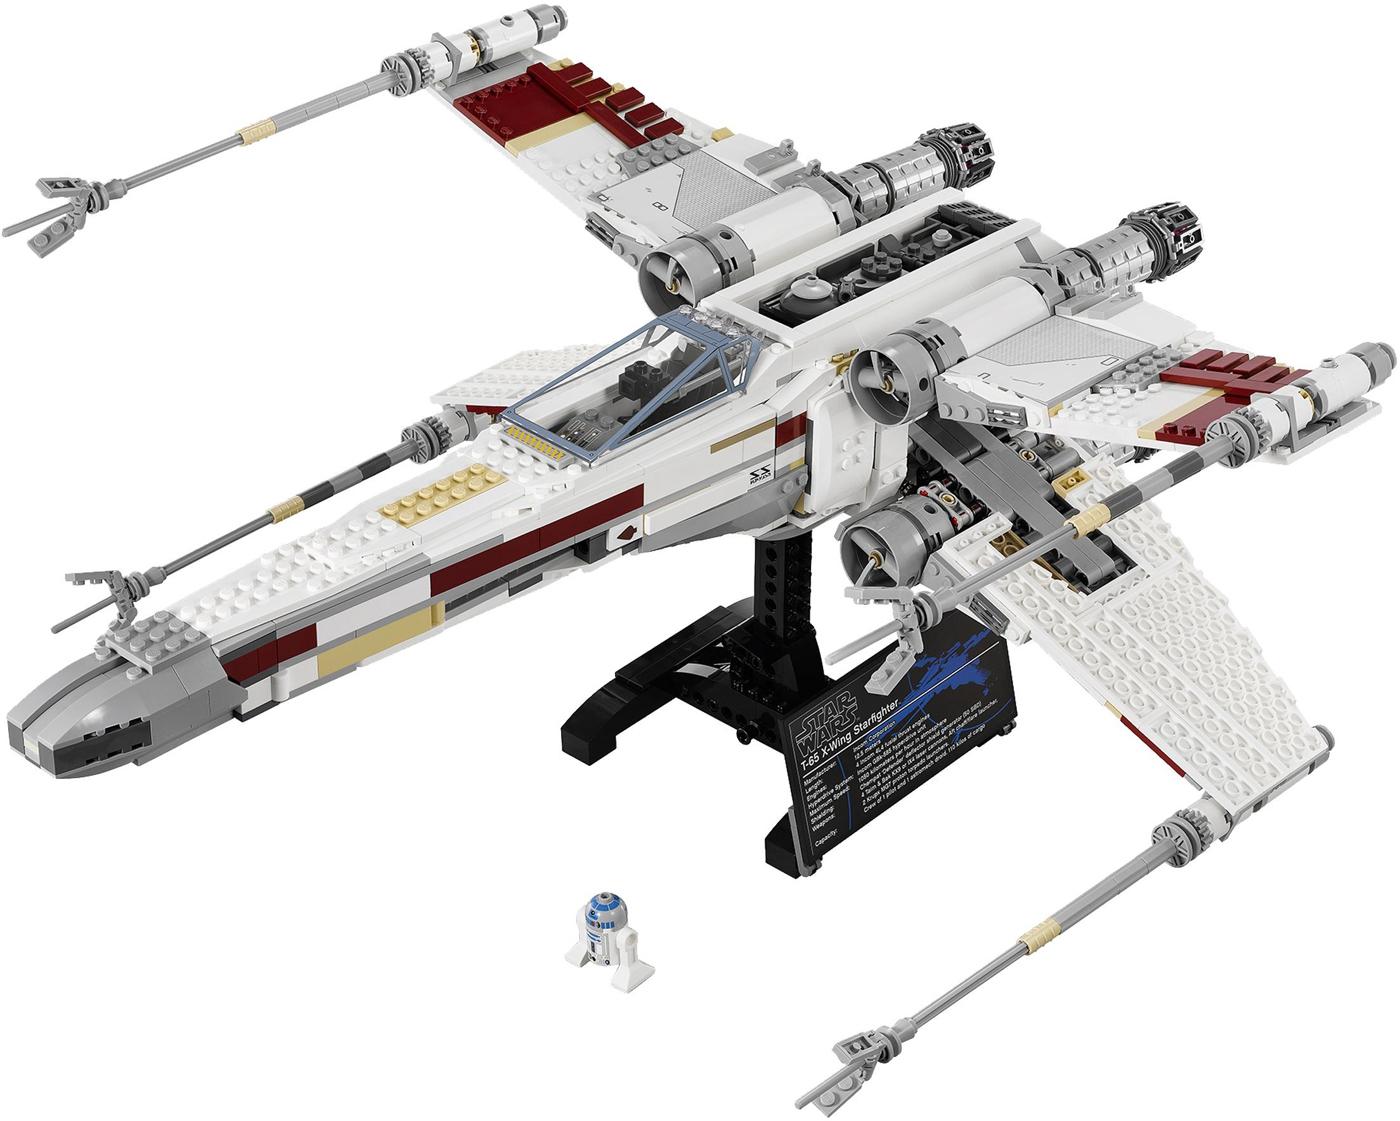 2019 LEGO Star Wars Sets Listed Via Amazon UK - The Brick Show